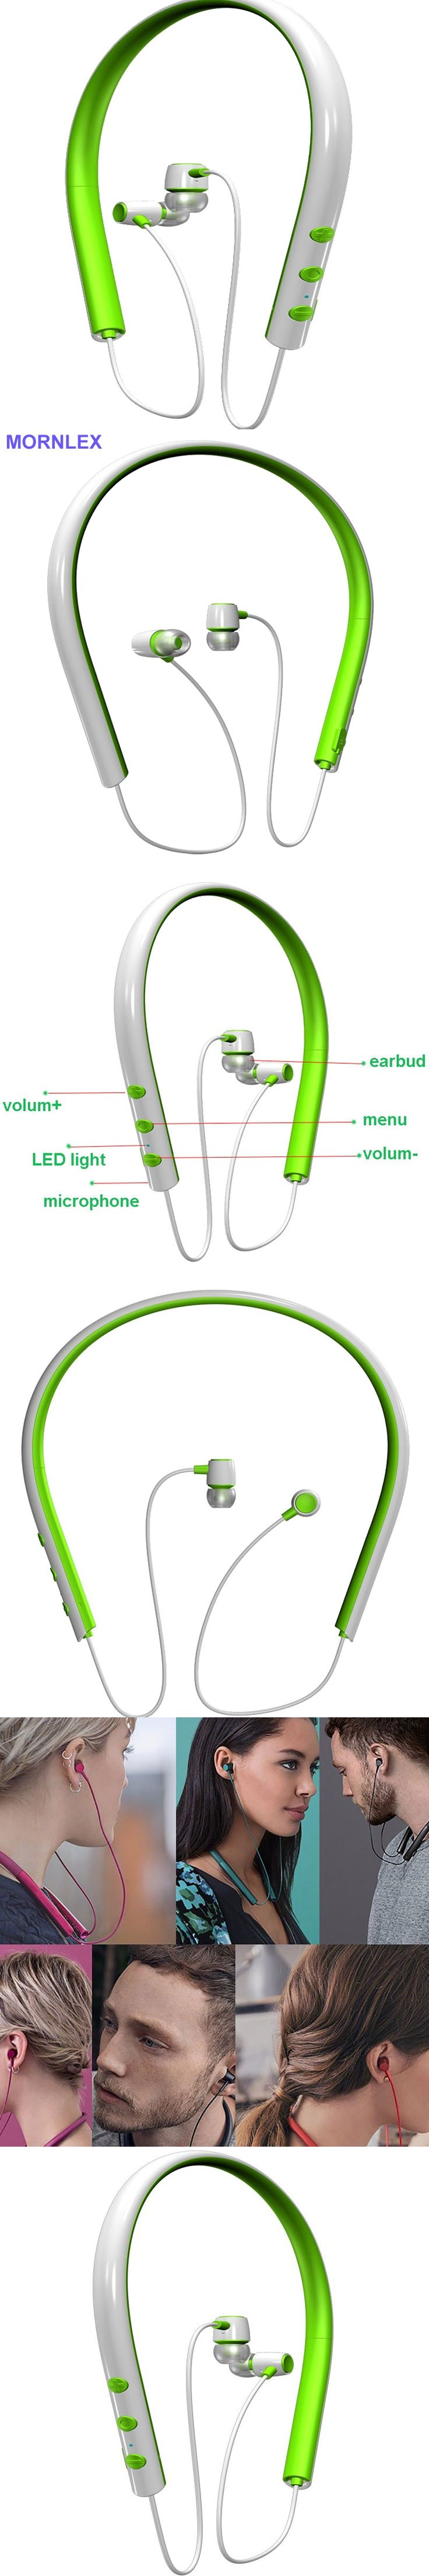 Fone de ouvido bluetooth earphone&headphone sport wireless headphones for a mobile phone APTX fashion earphone auriculares